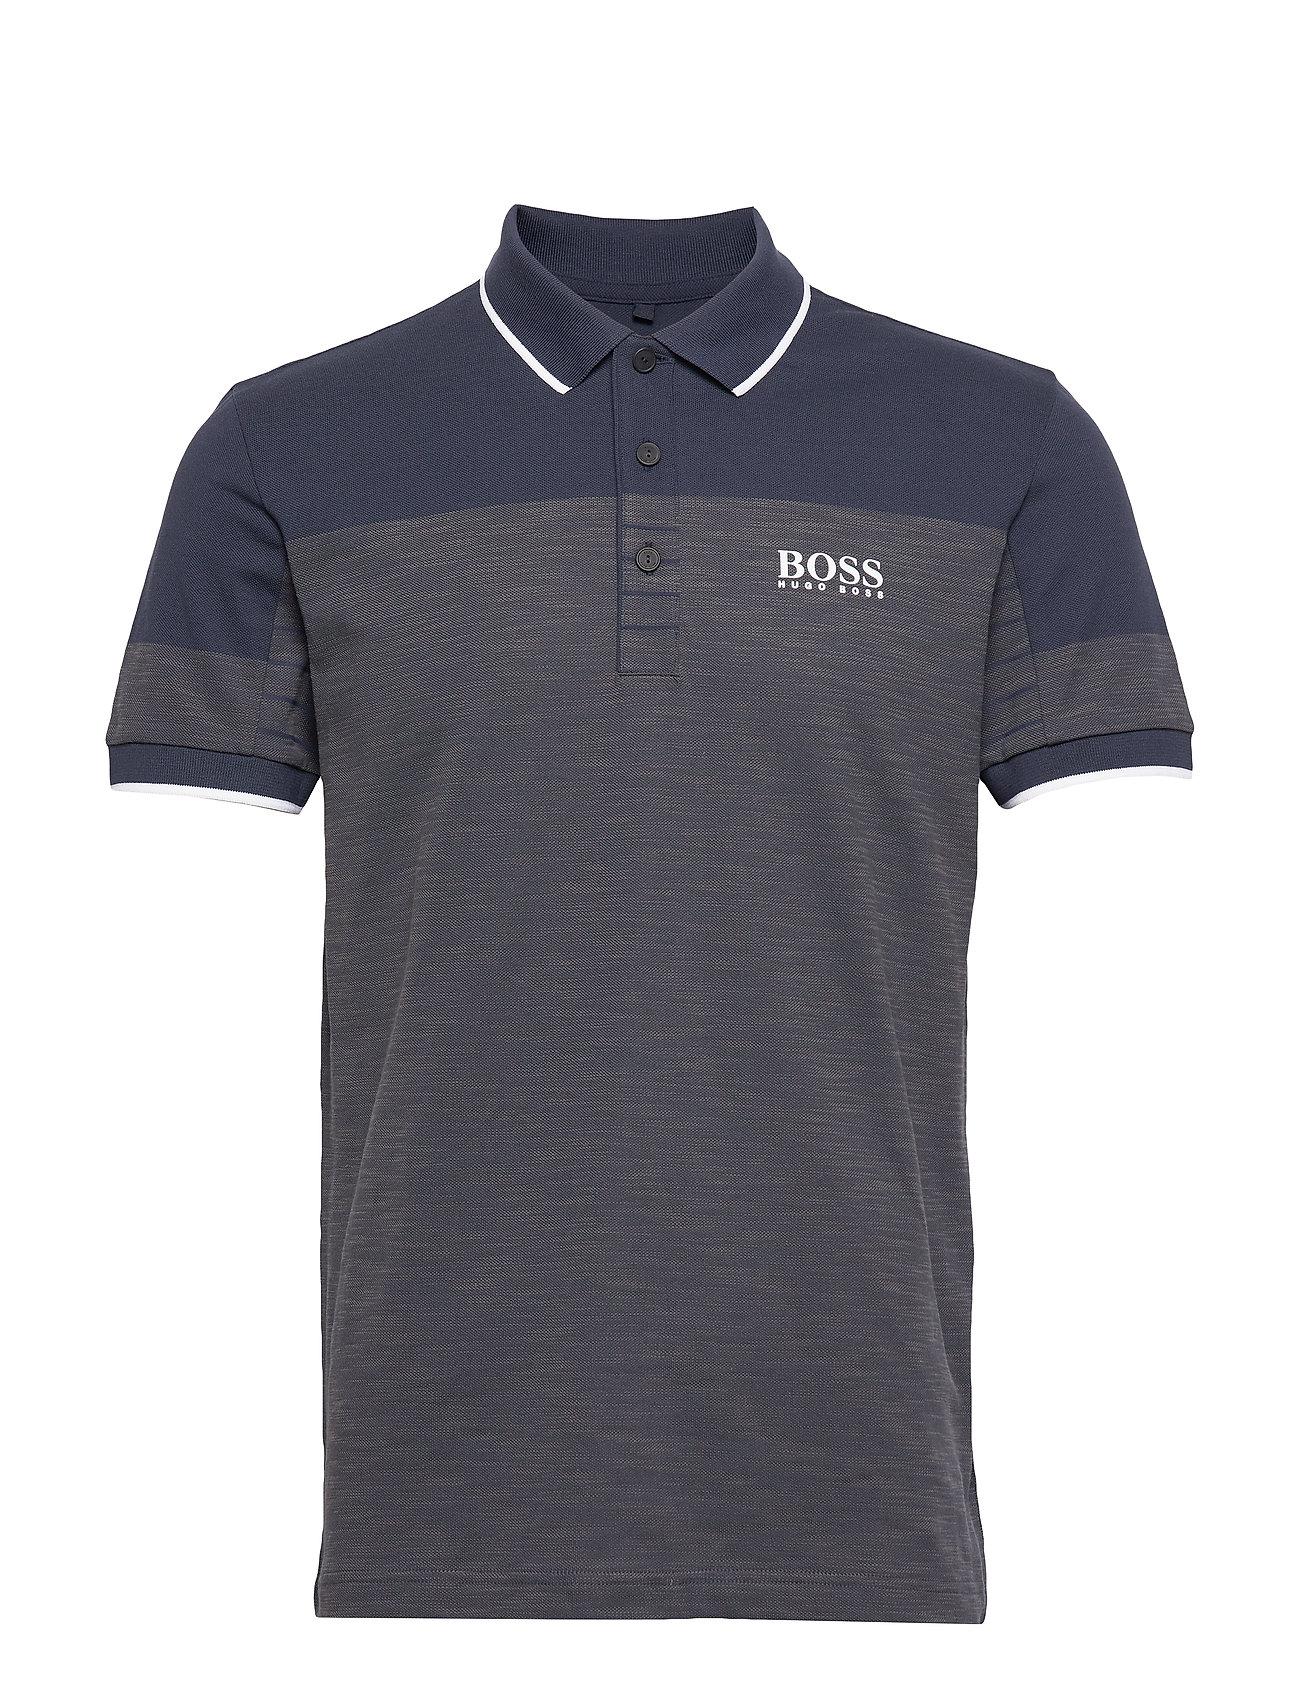 Boss Athleisure Wear Paddy Pro 2 - NAVY